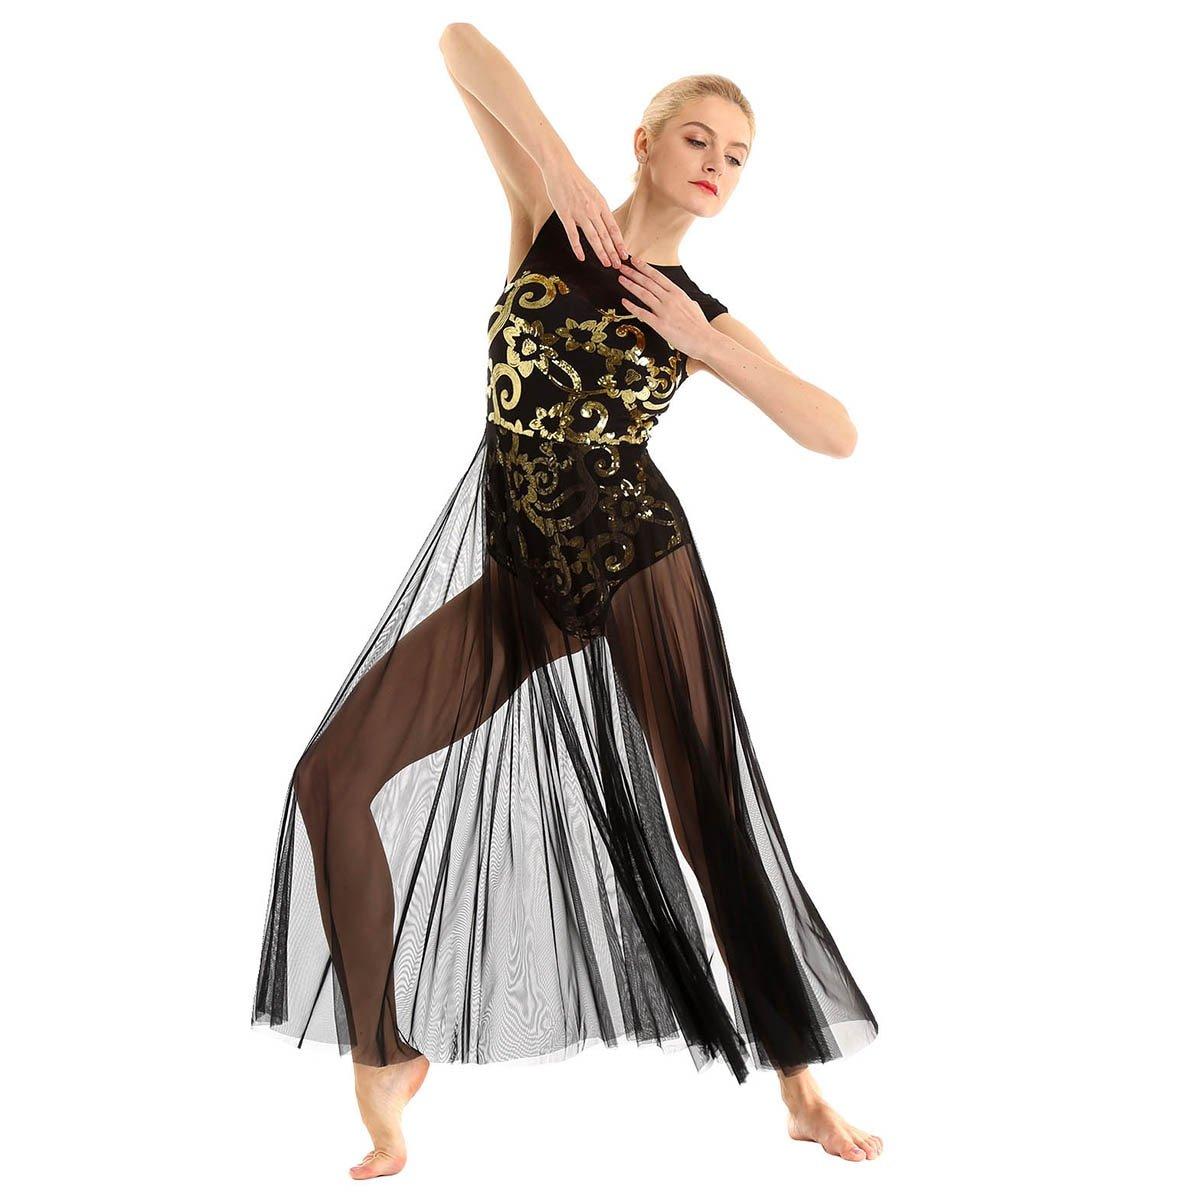 Gold /& Black Adult Dance Dress Costume